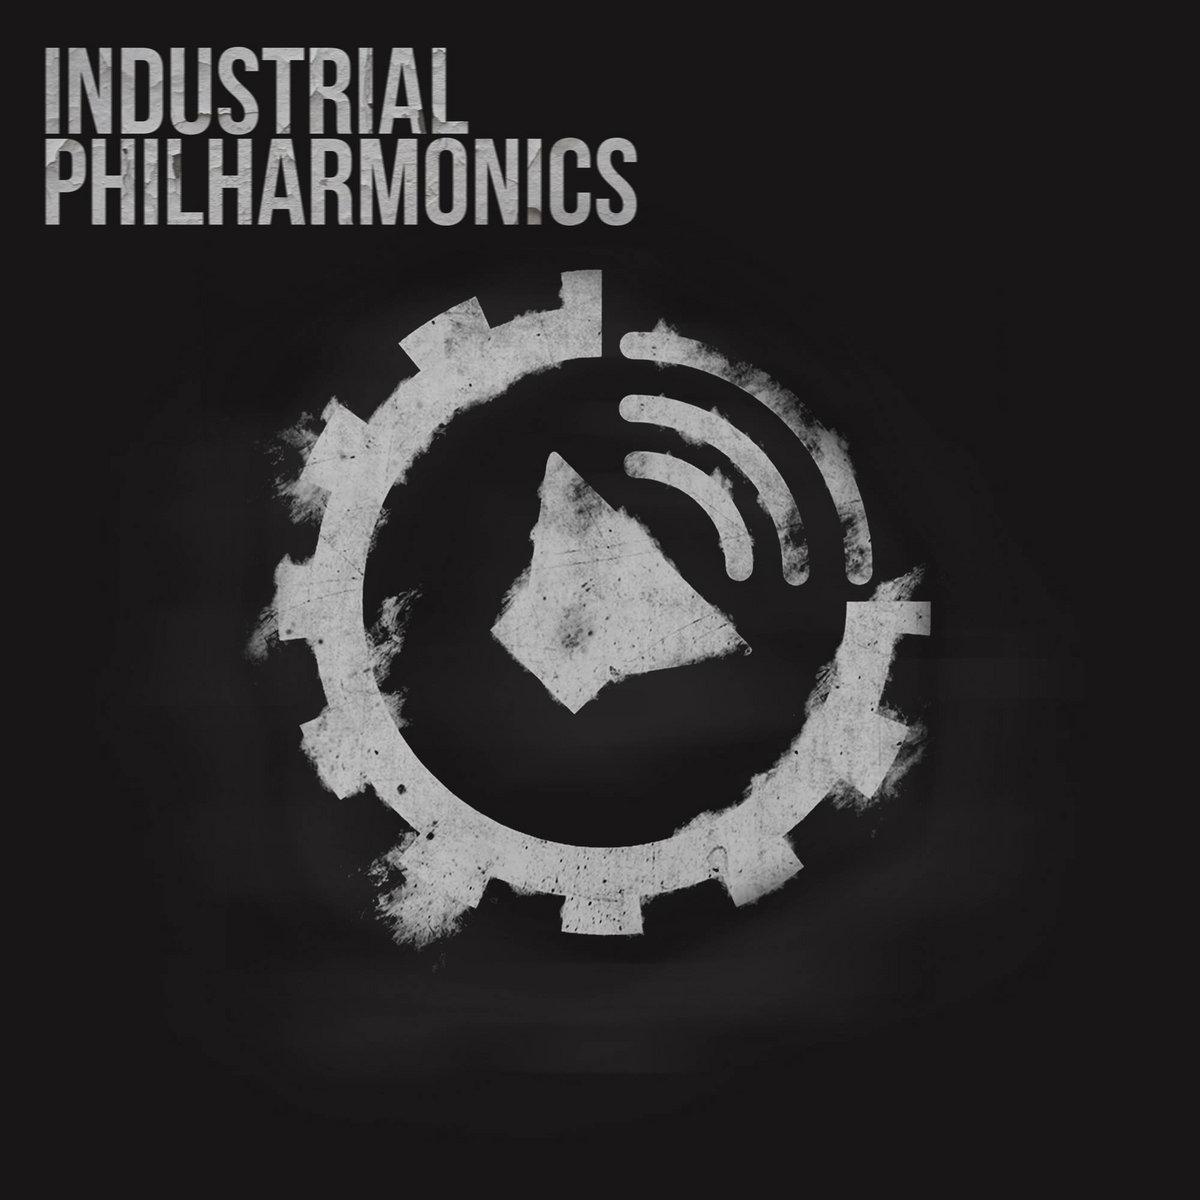 Apta Creed Of Darkness Iphr008 Industrial Philharmonics